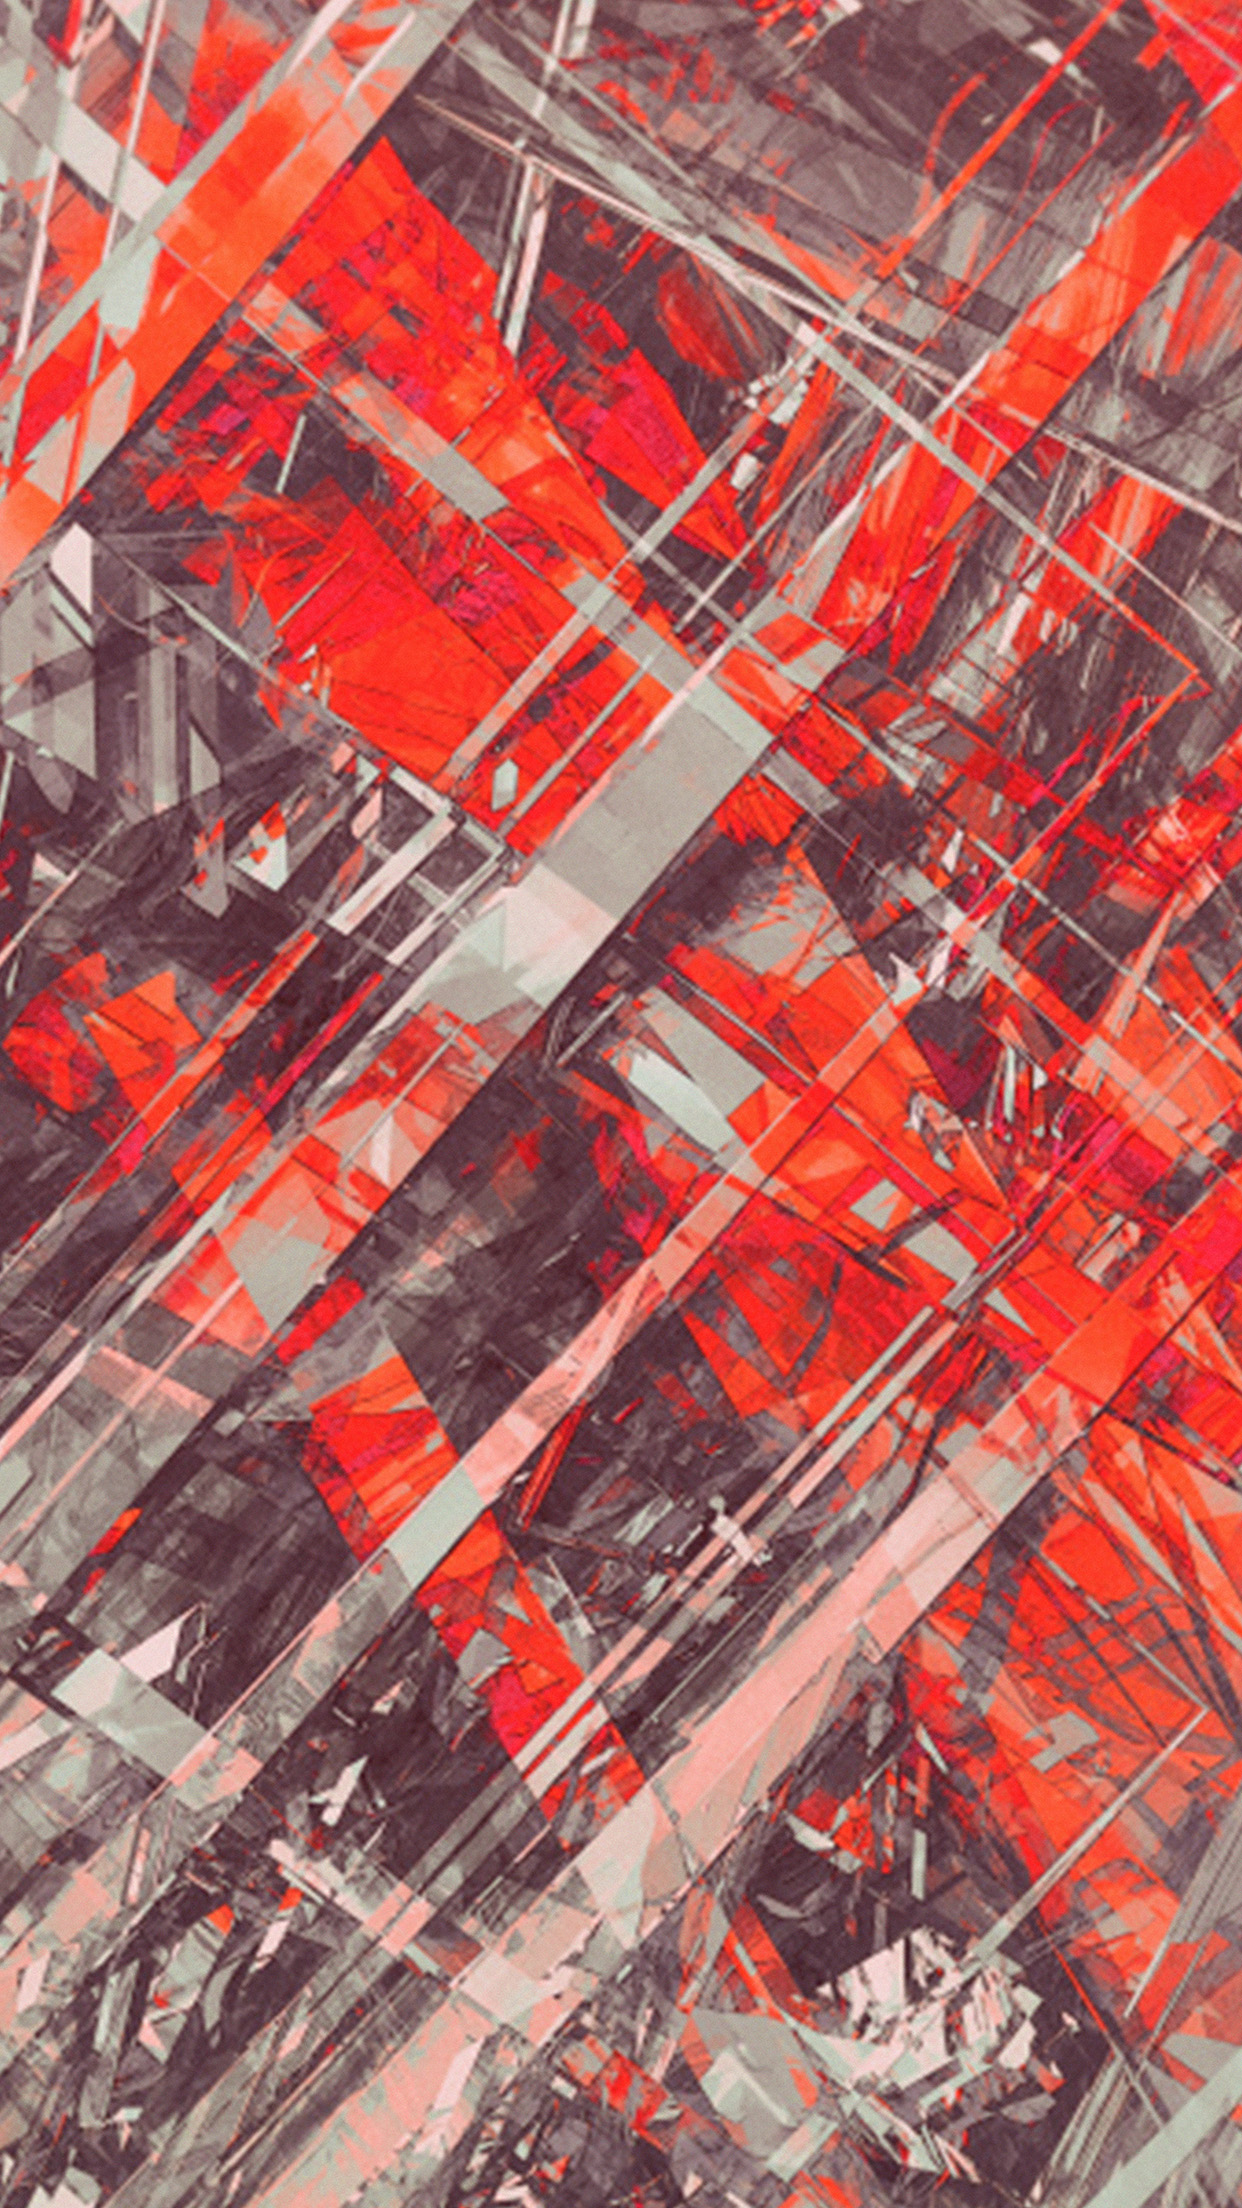 Papers Co Iphone Wallpaper Az31 Red Atelier Olschinsky Illustration Art